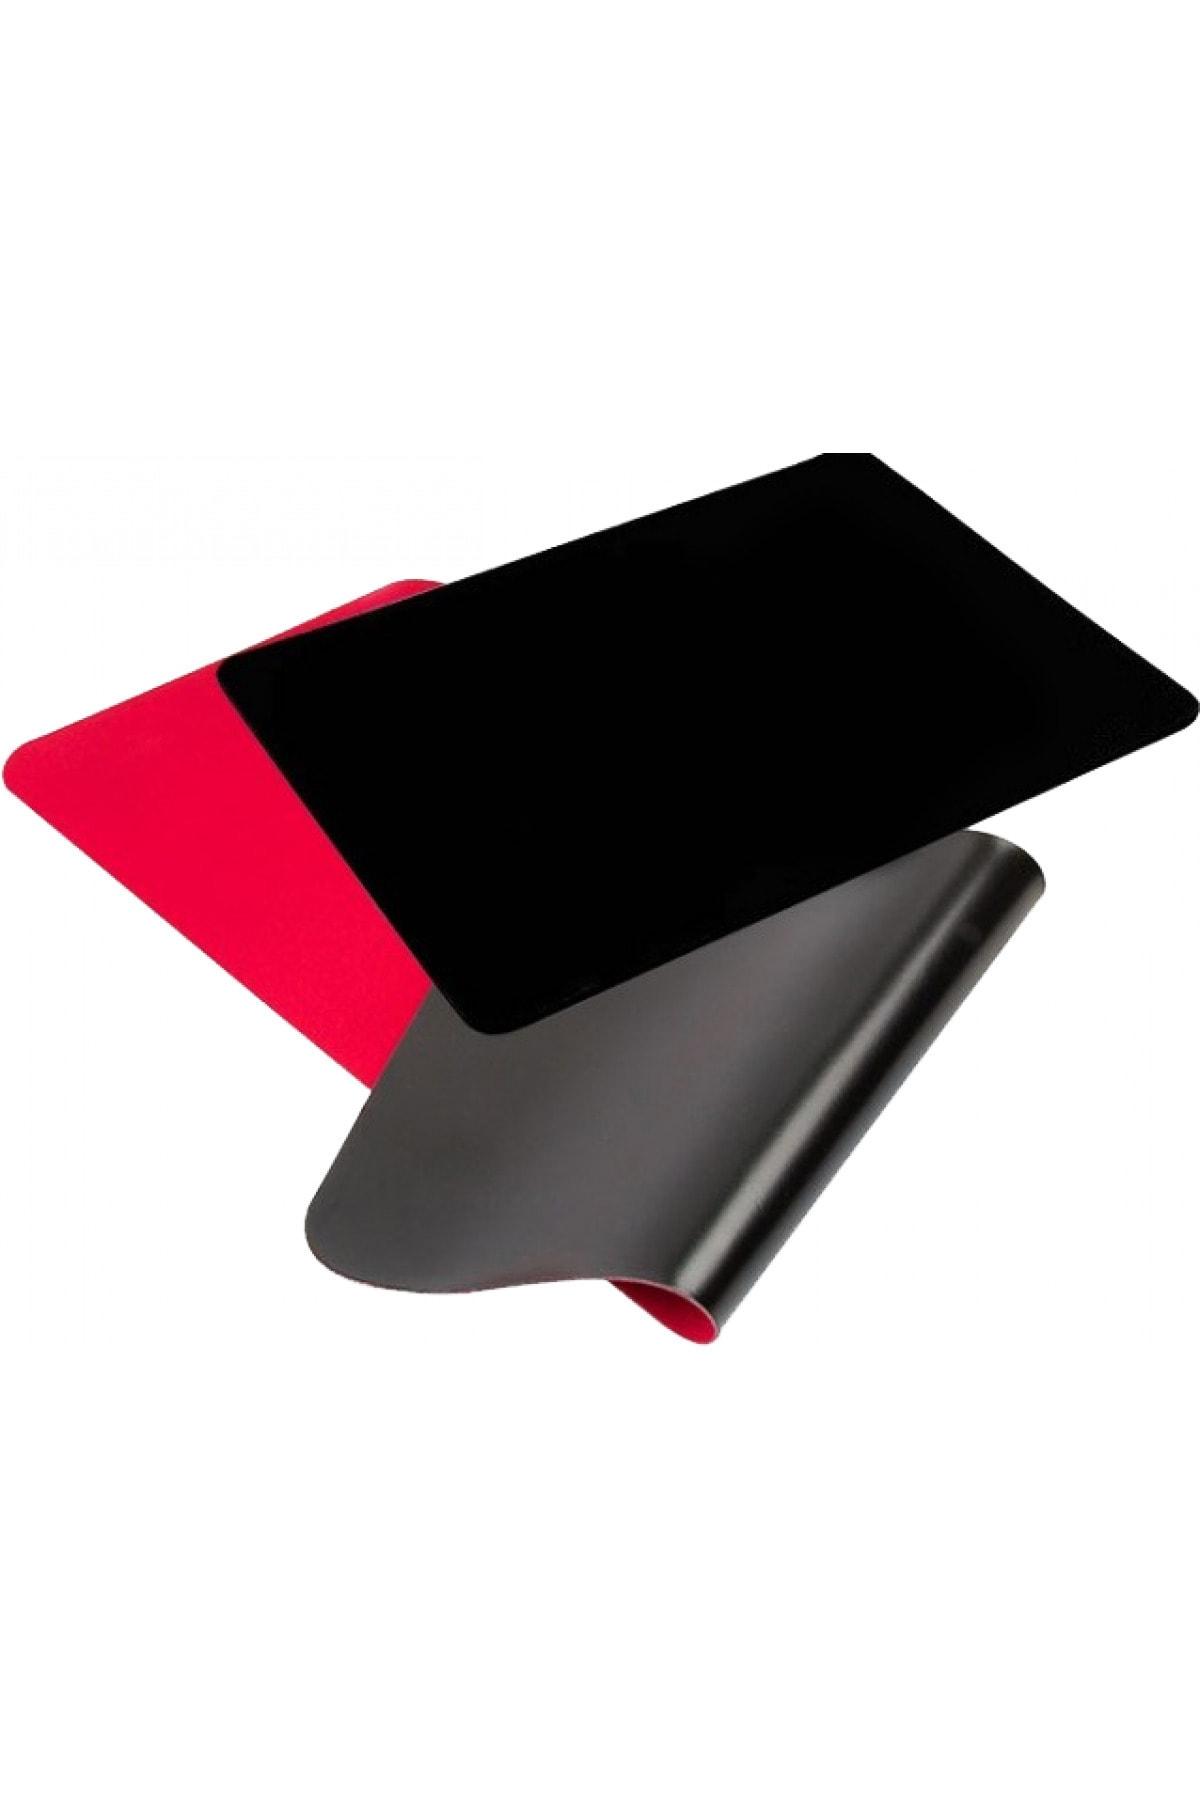 Mouse Pad Kaymaz Taban 18x23cm